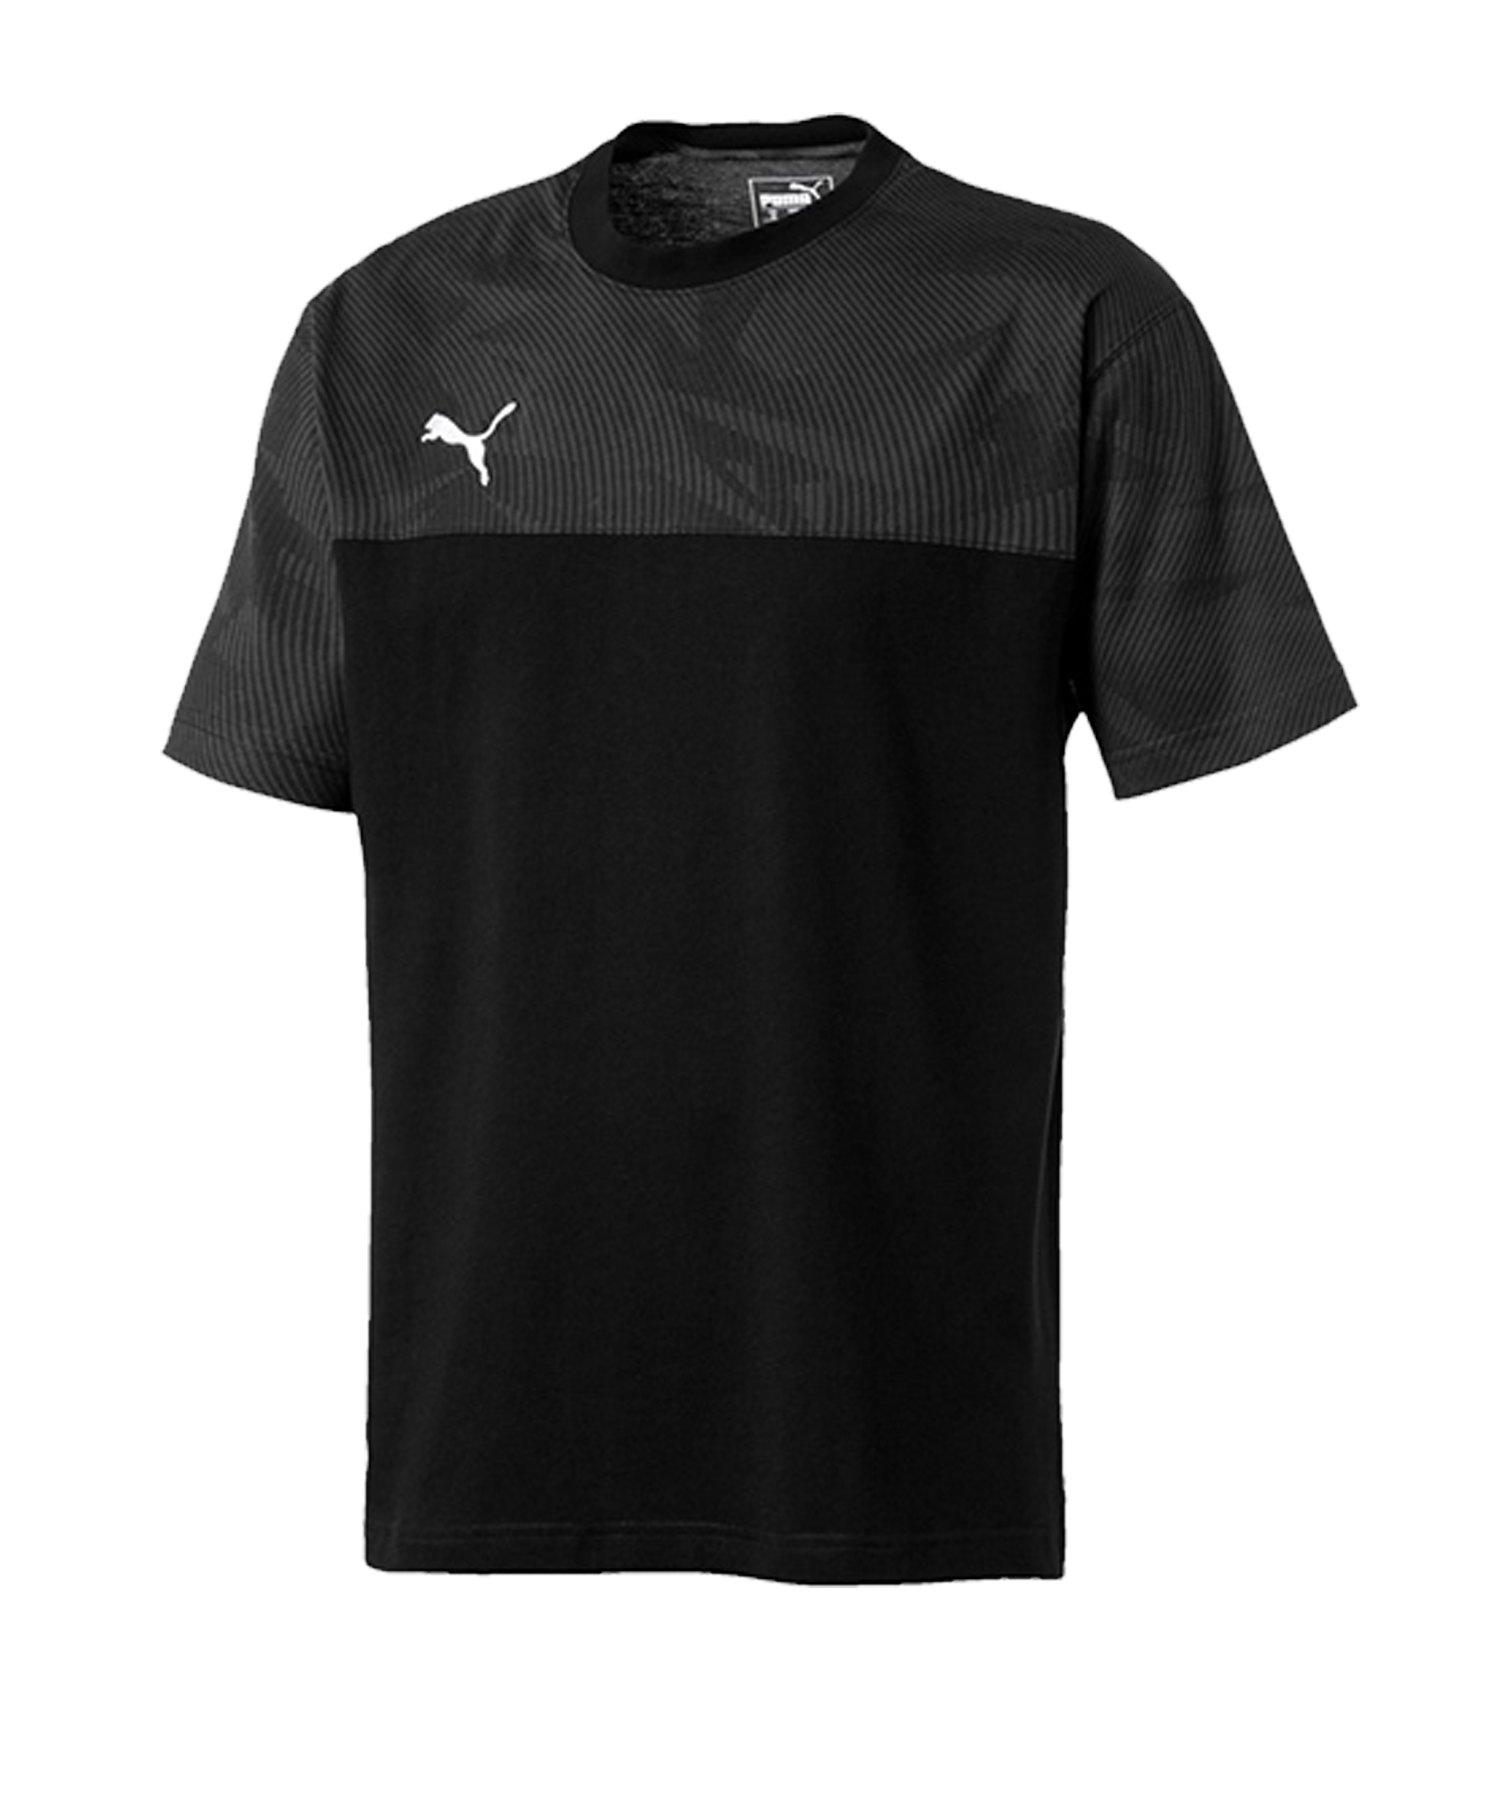 PUMA CUP Casuals Tee T-Shirt Schwarz F03 - schwarz